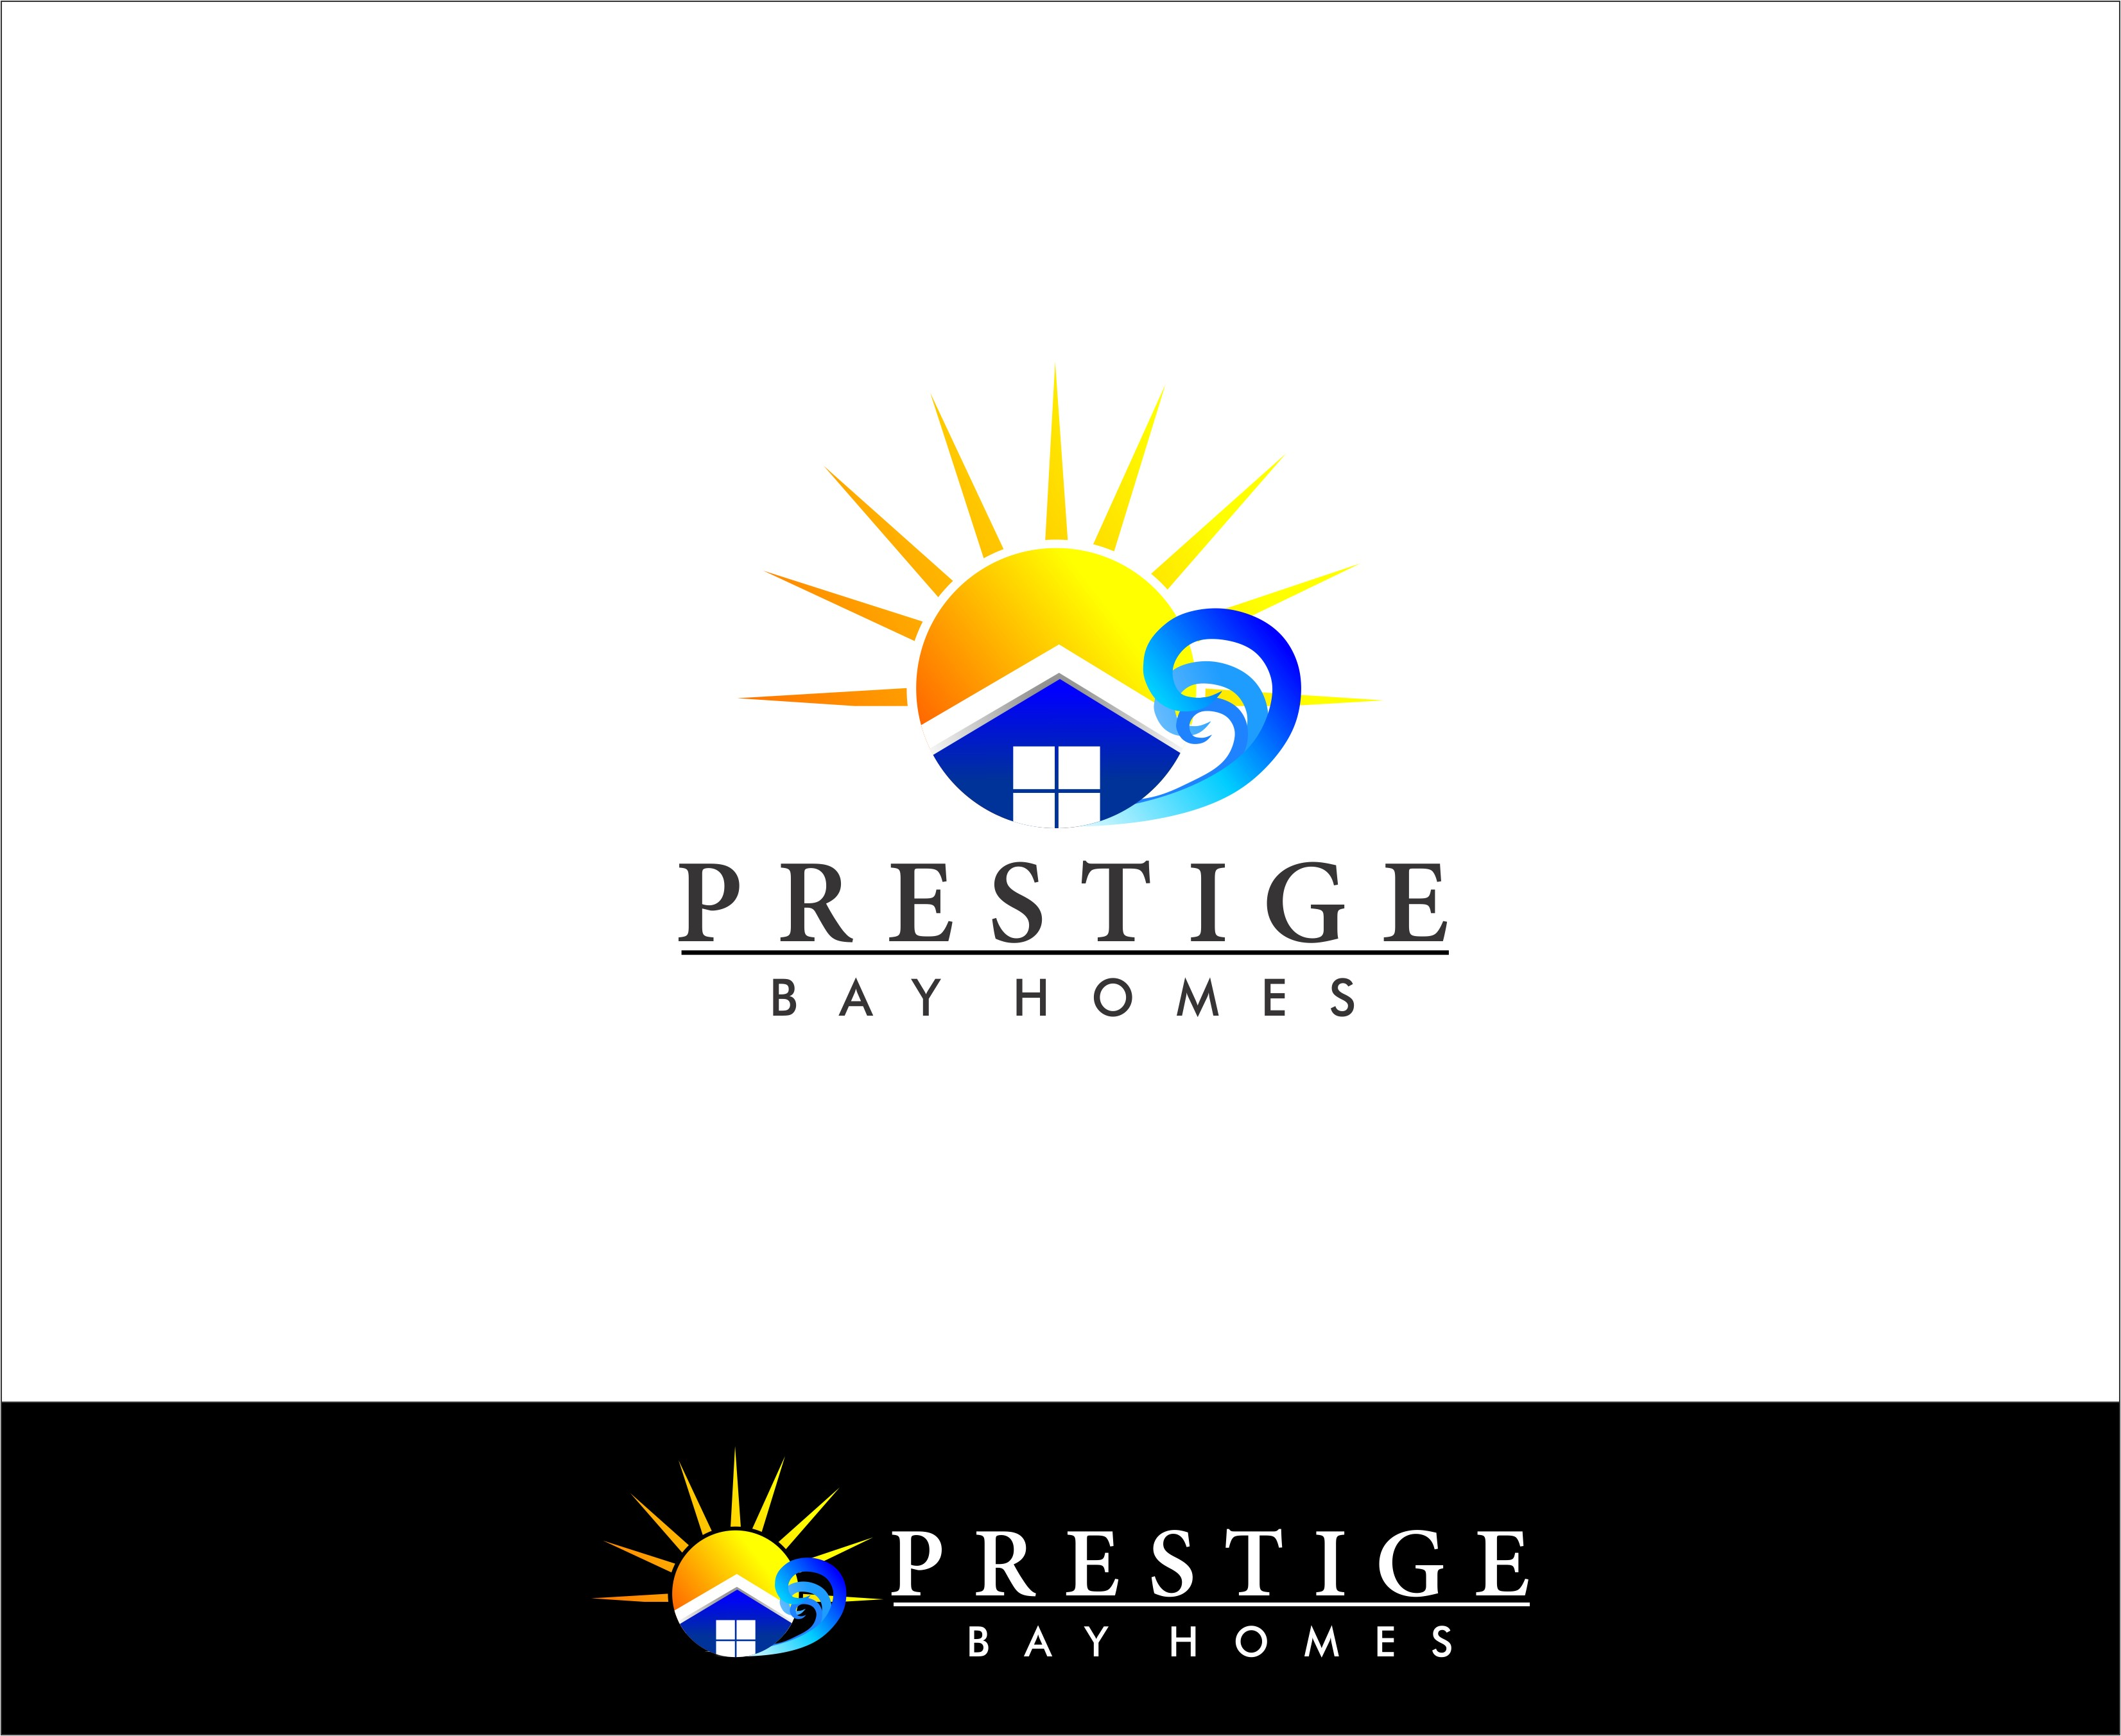 Logo Design by Mhon_Rose - Entry No. 15 in the Logo Design Contest Imaginative Logo Design for Prestige Bay Homes.